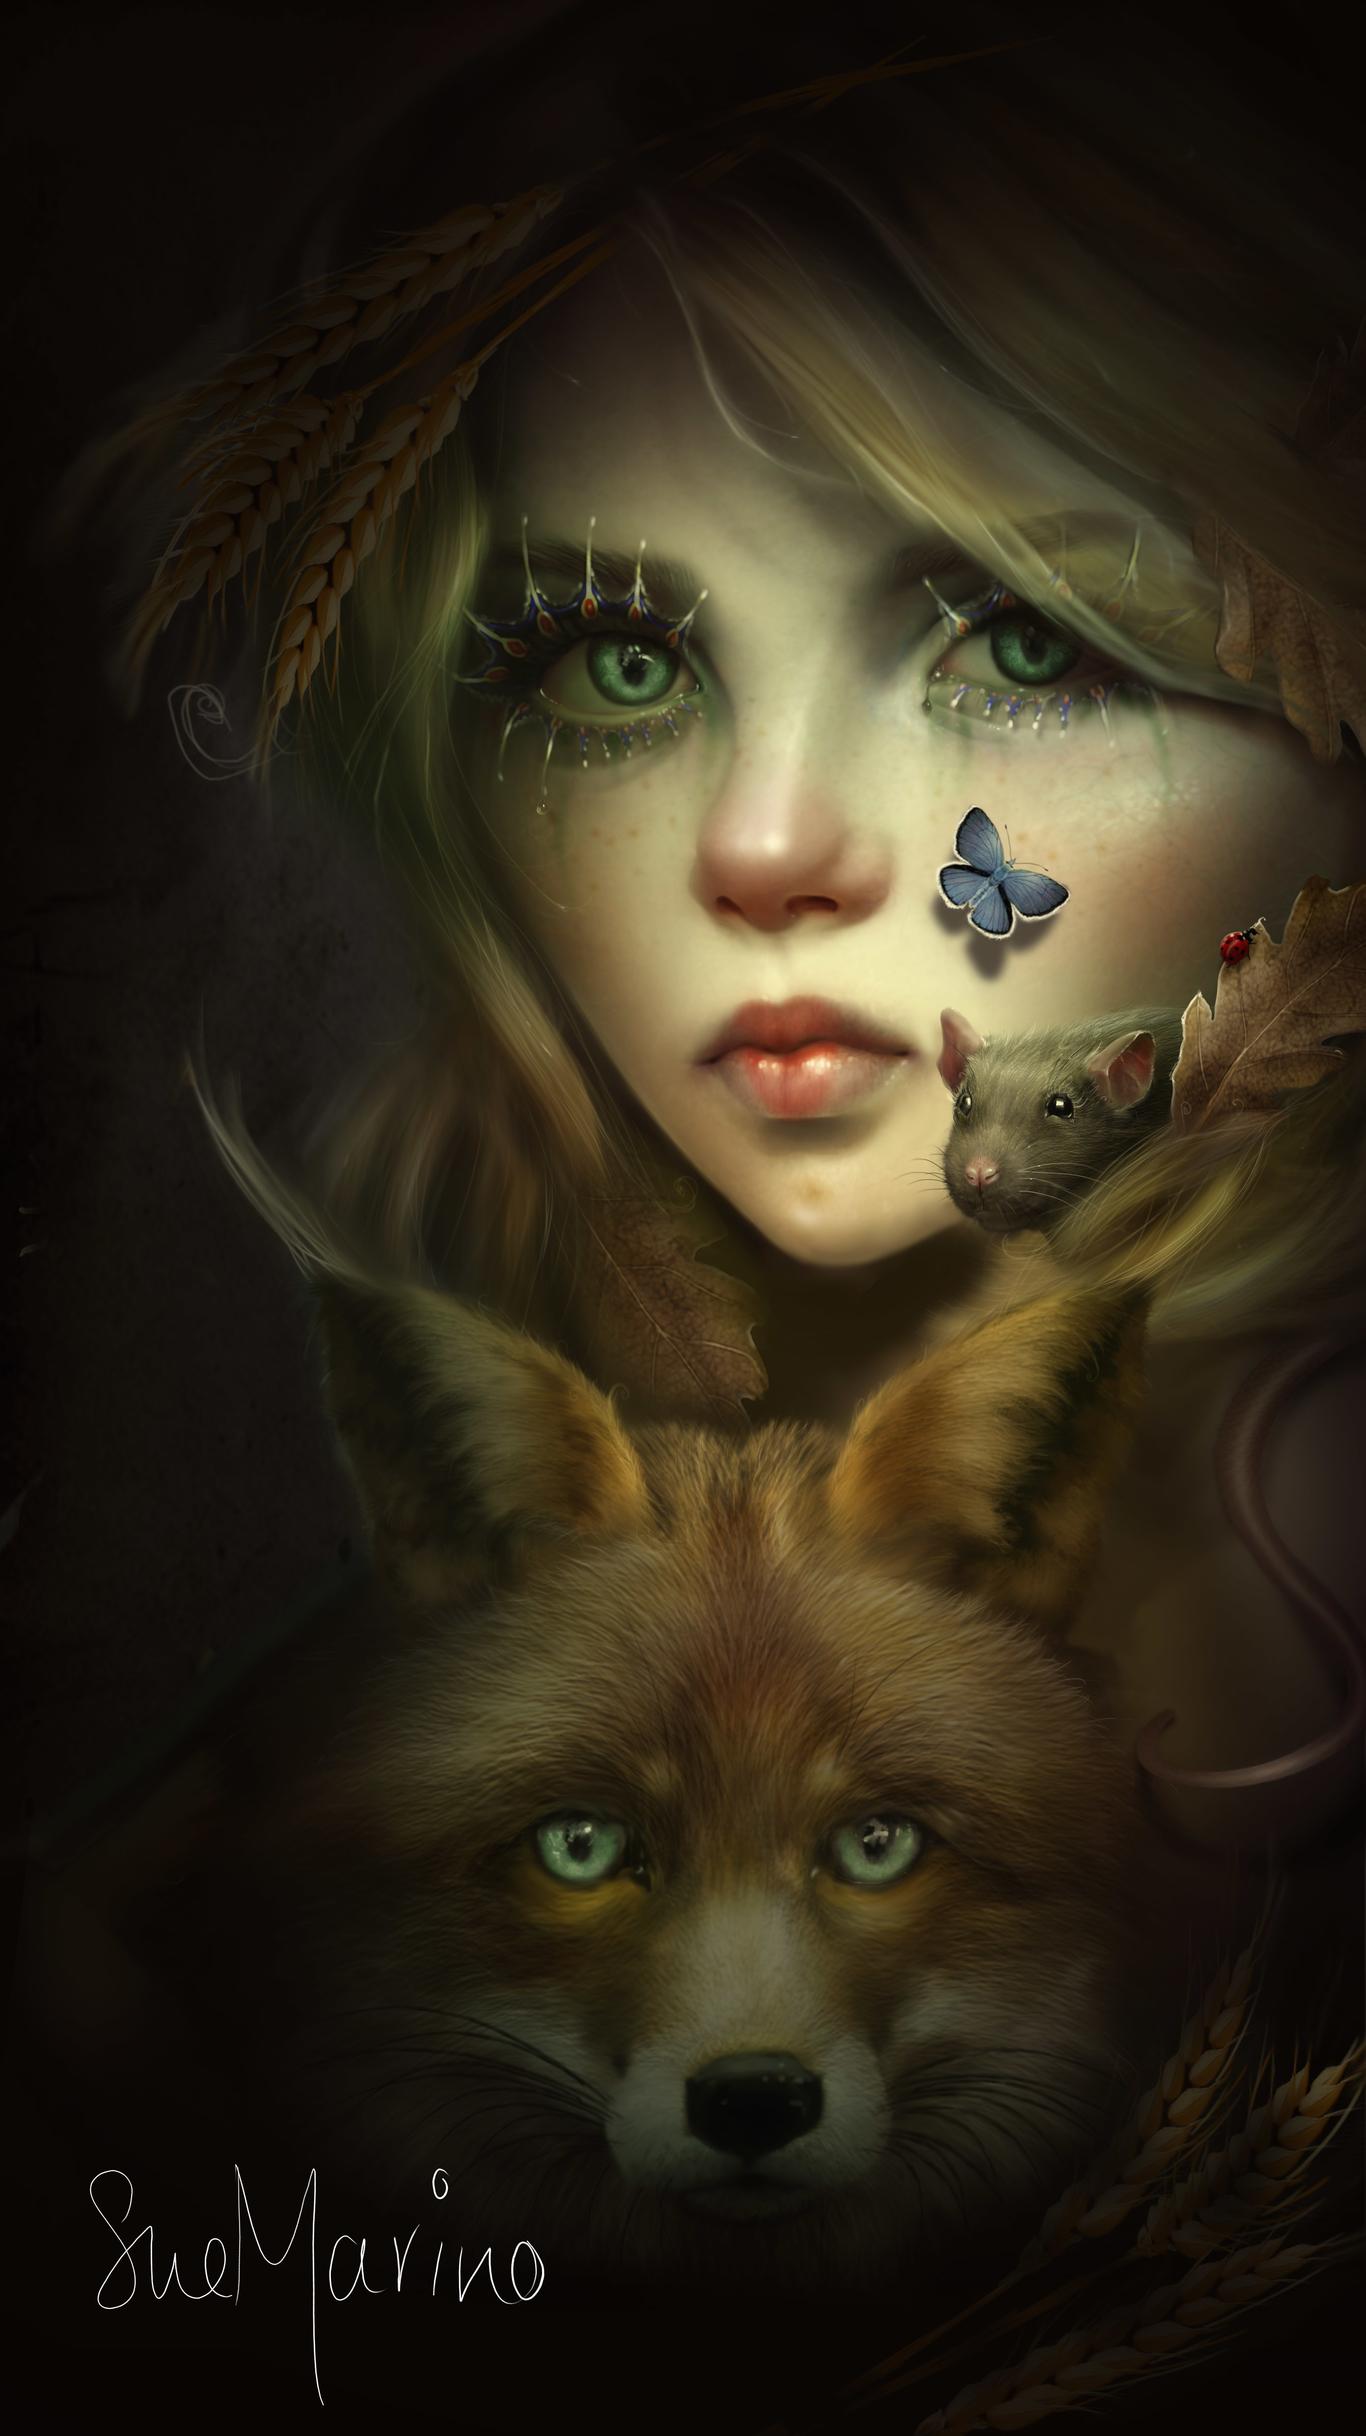 Evniki sister fox 1 3f340e56 ohf7